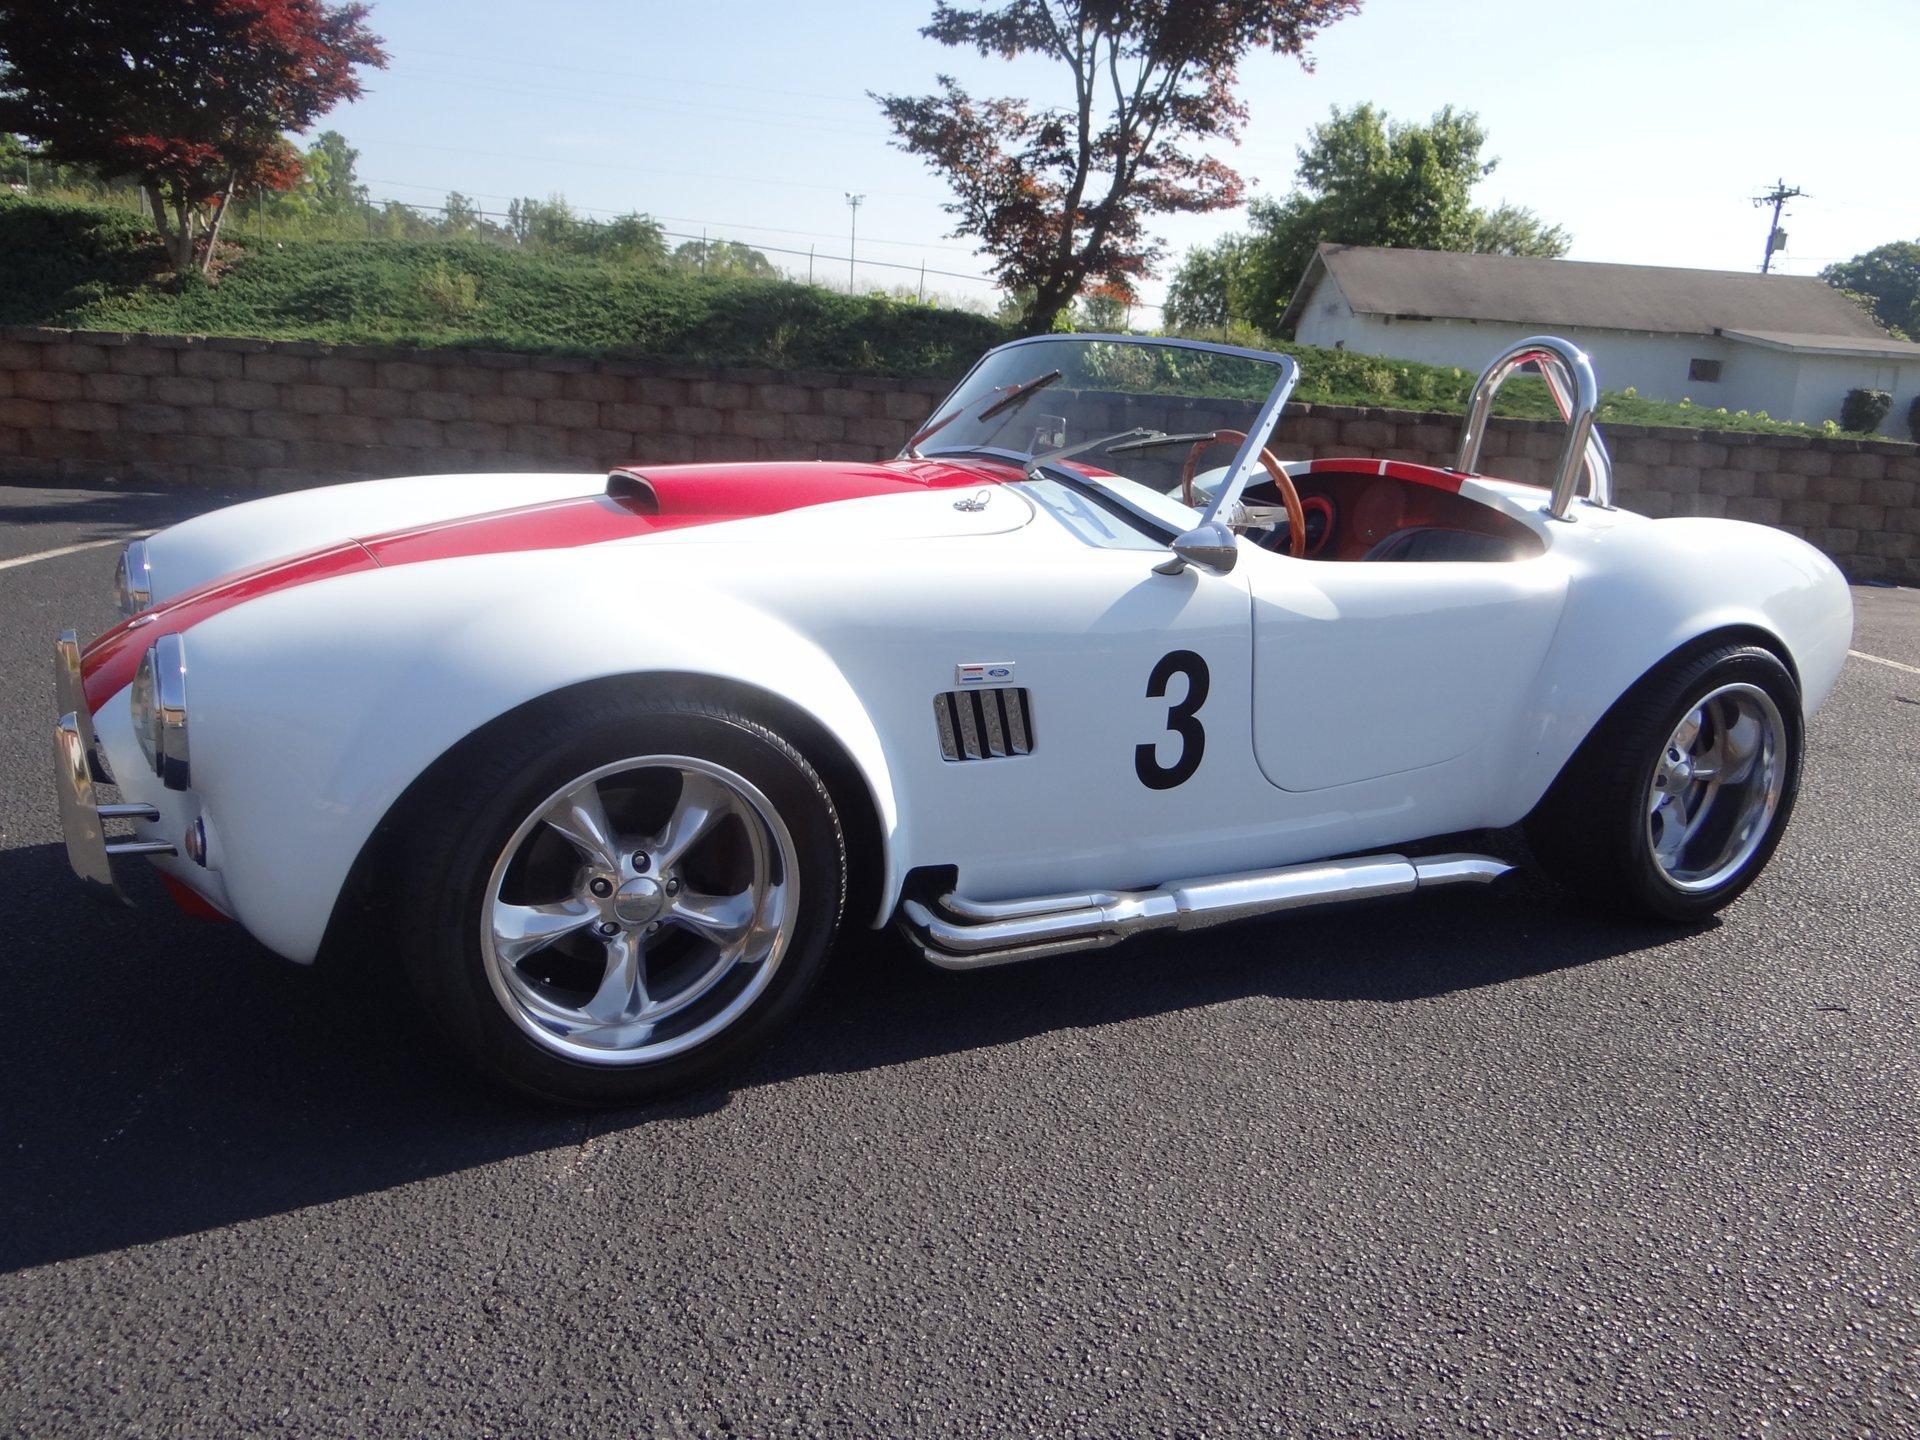 1998 lonestar 1966 cobra replica kit car